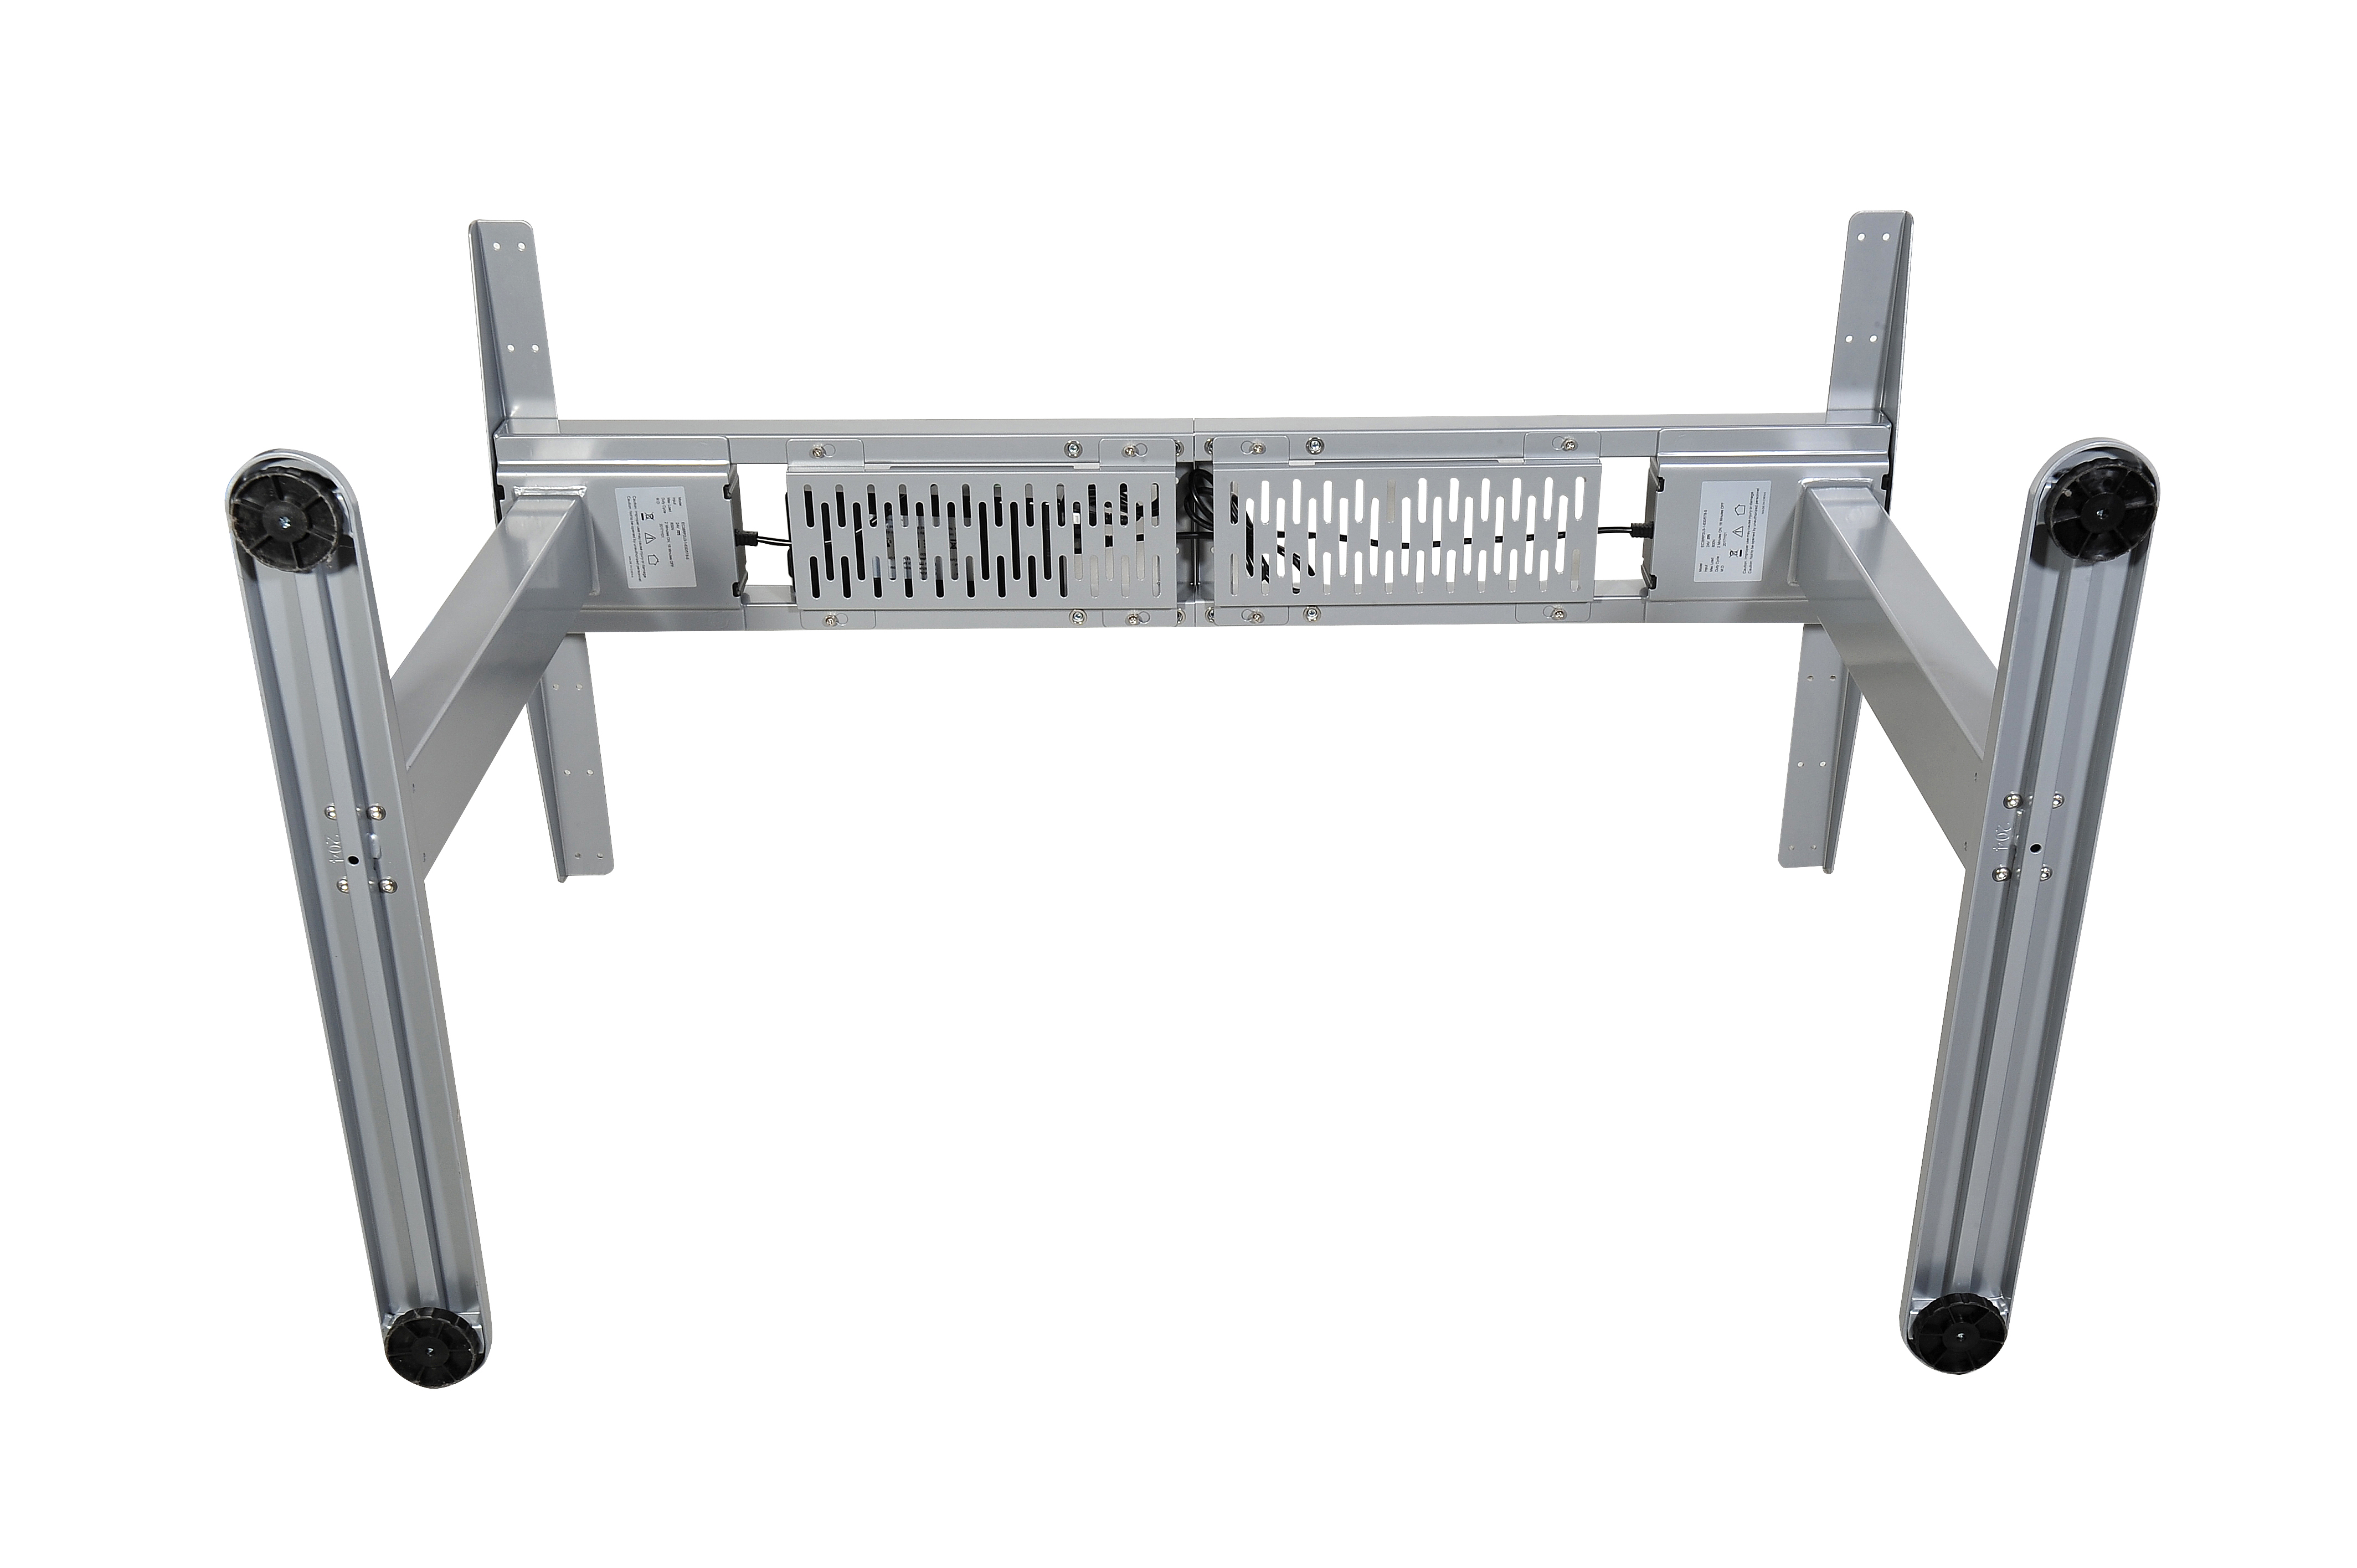 Spire SPLTET204-S - 1200 mm - 800 mm - 630 mm - 20 kg - 1250 mm - 850 mm